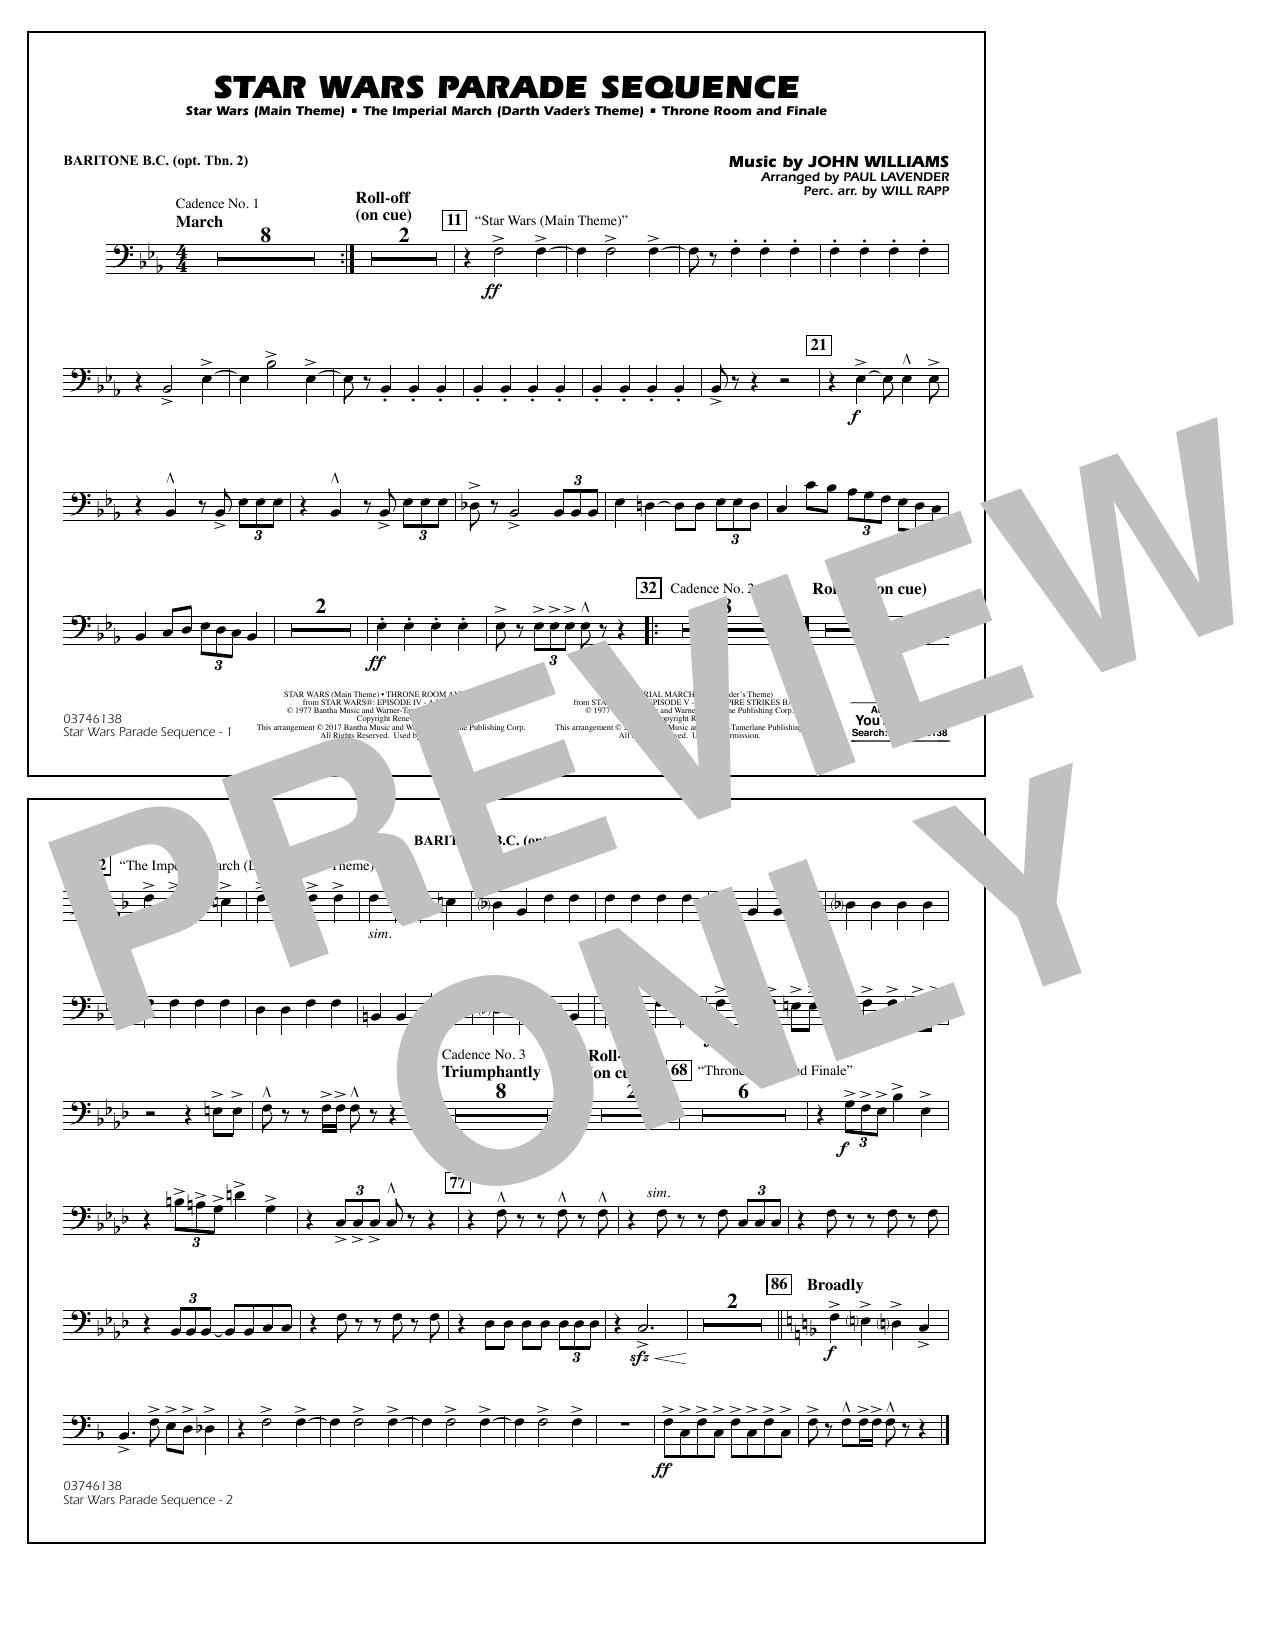 Star Wars Parade Sequence - Baritone B.C. (Opt. Tbn. 2) Sheet Music